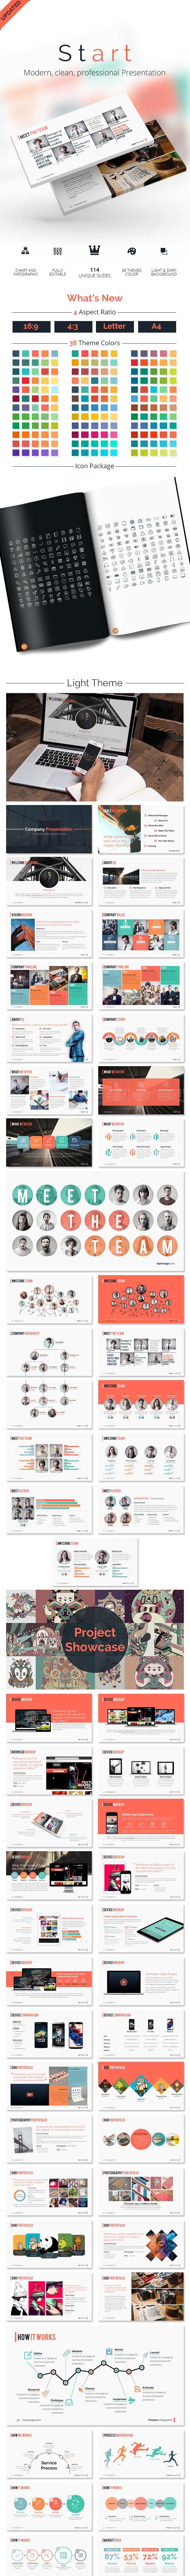 START Powerpoint - Modern Clean Presentation - Abstract PowerPoint Templates